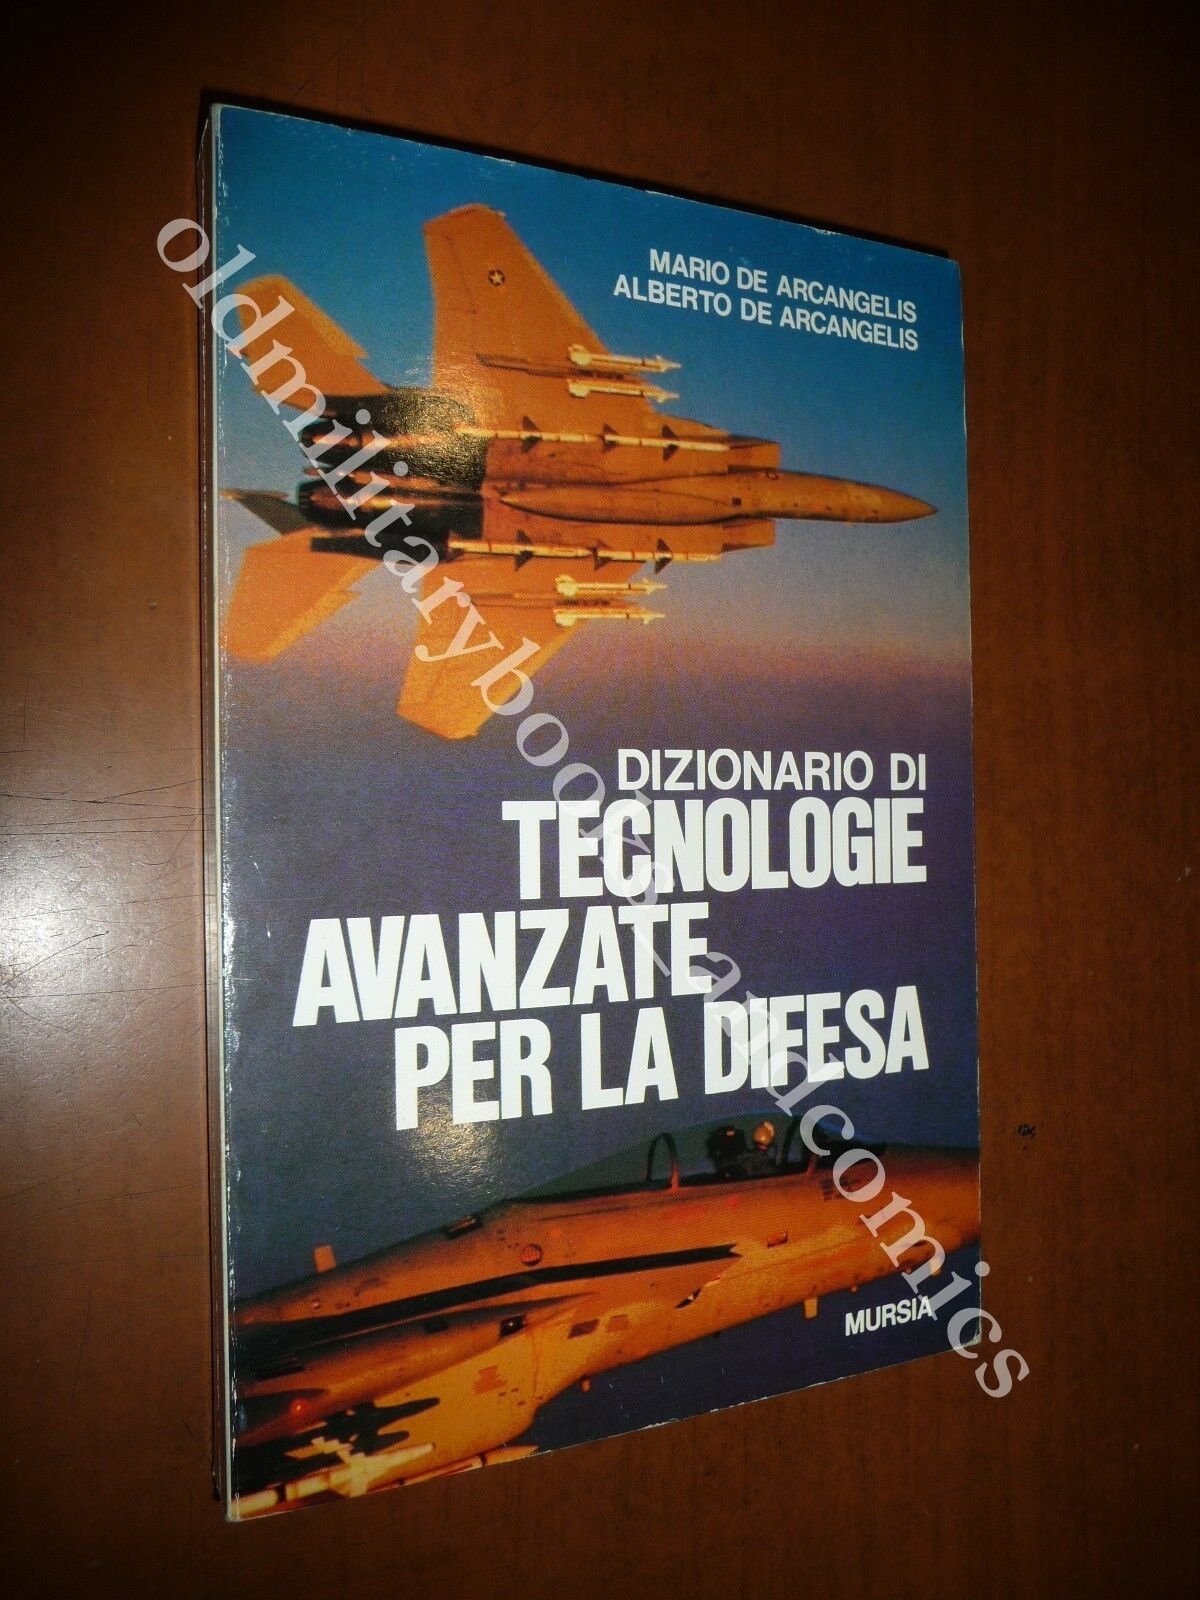 DIZIONARIO DI TECNOLOGIE AVANZATE PER LA DIFESA DE ARCANGELIS 1993